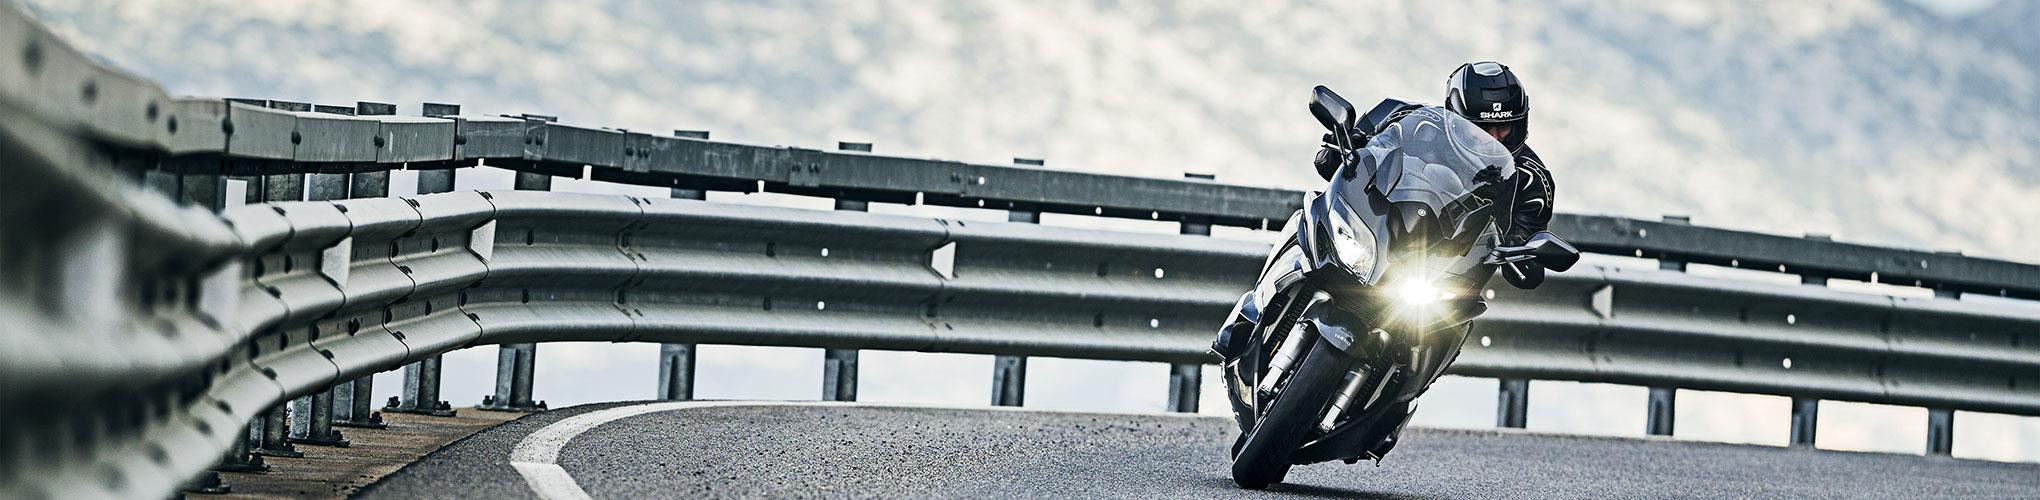 Yamaha FJR1300A | MotorCentrumWest